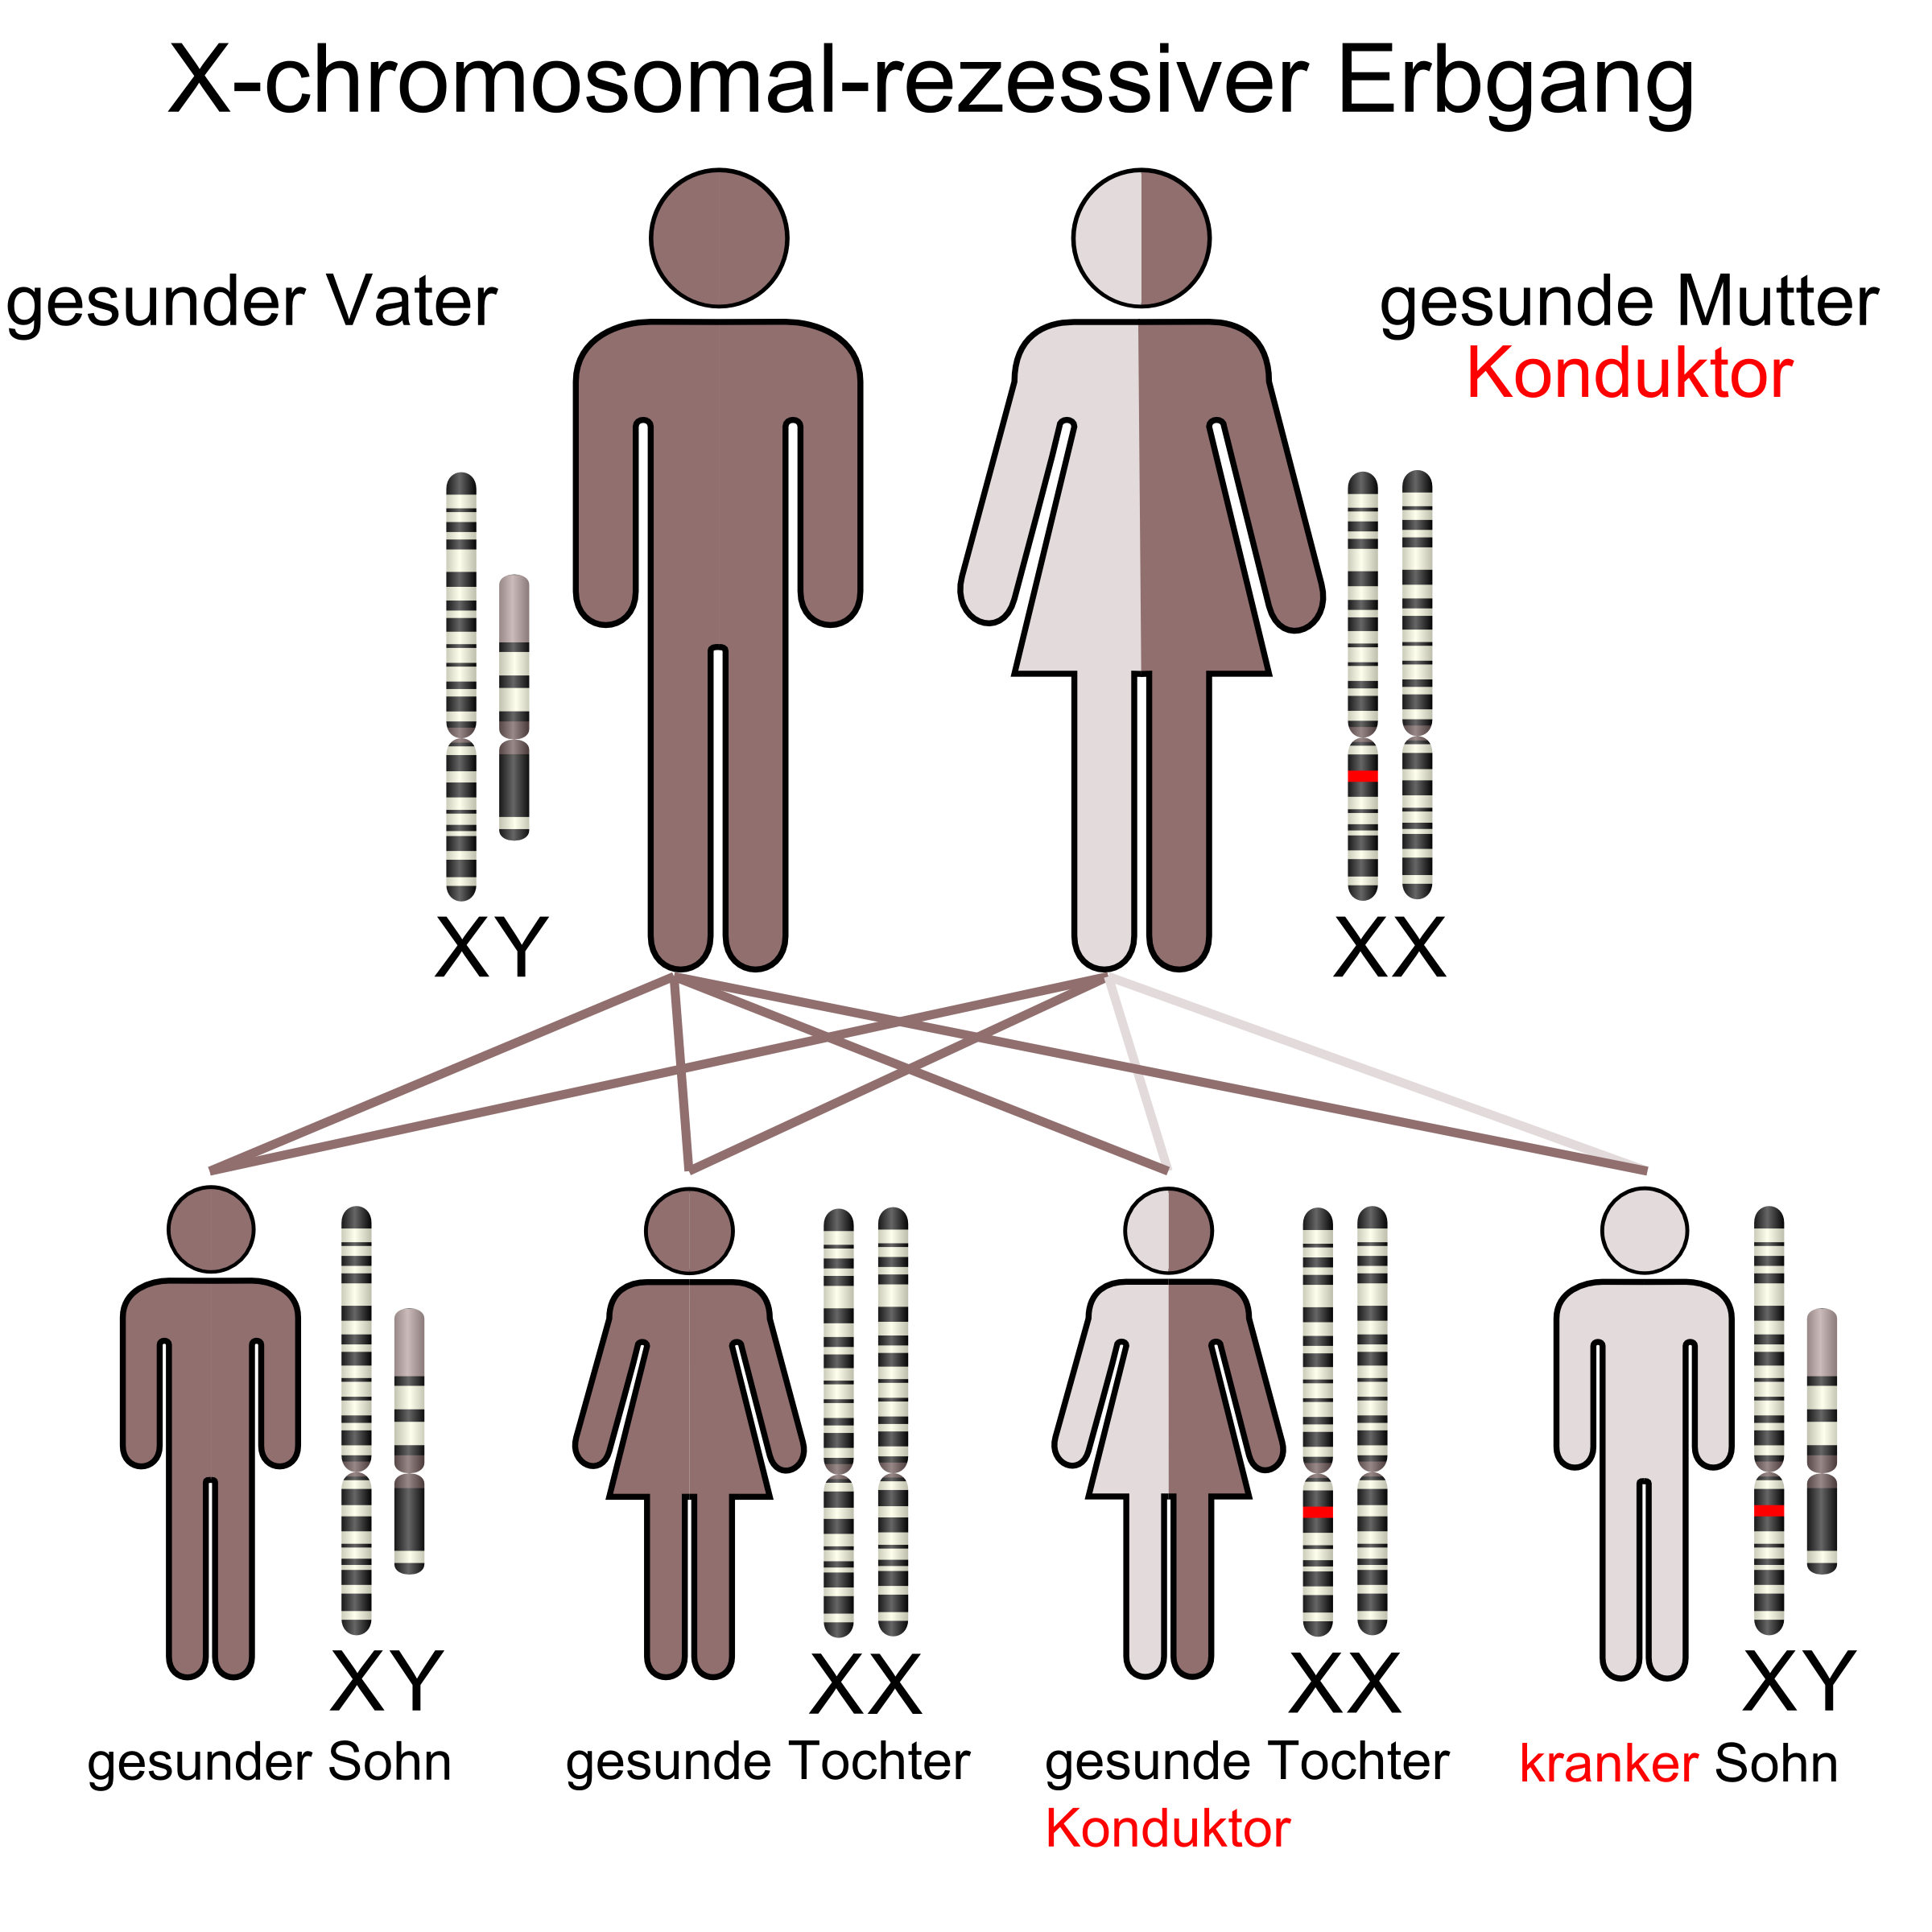 X-chromosomal-rezessive-Mutter.png